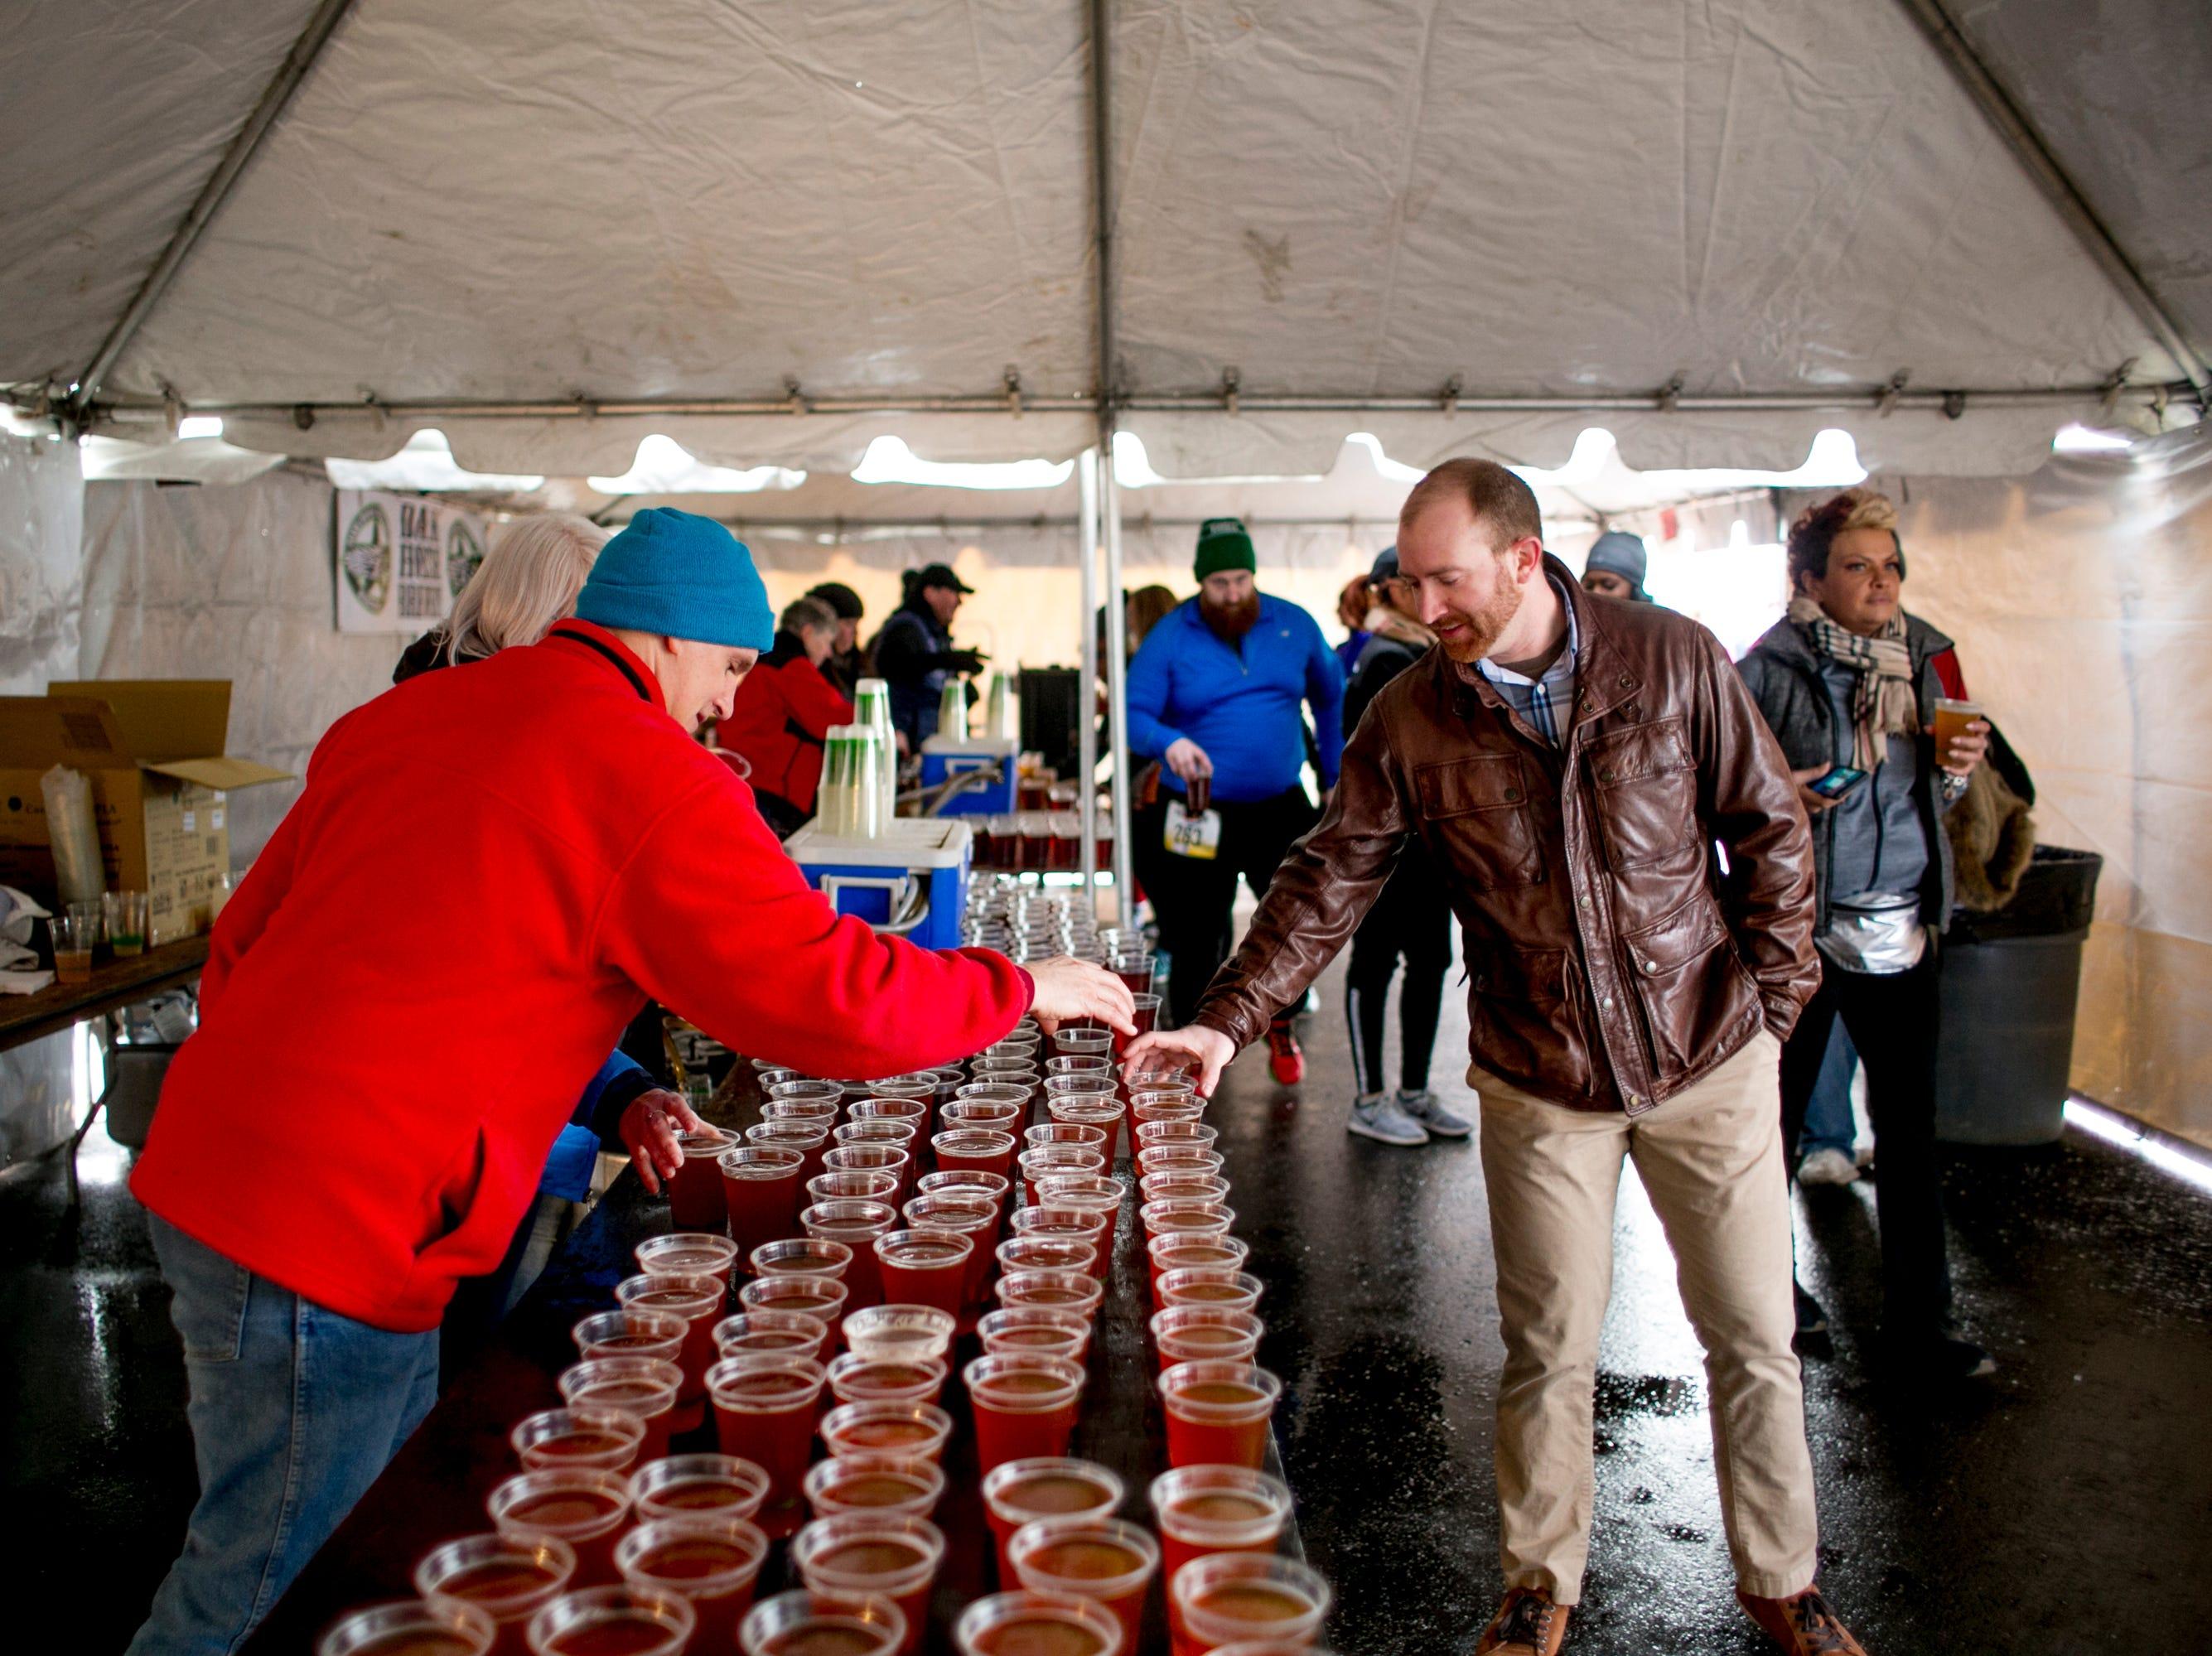 A man grabs a beer at the Paczki Run.